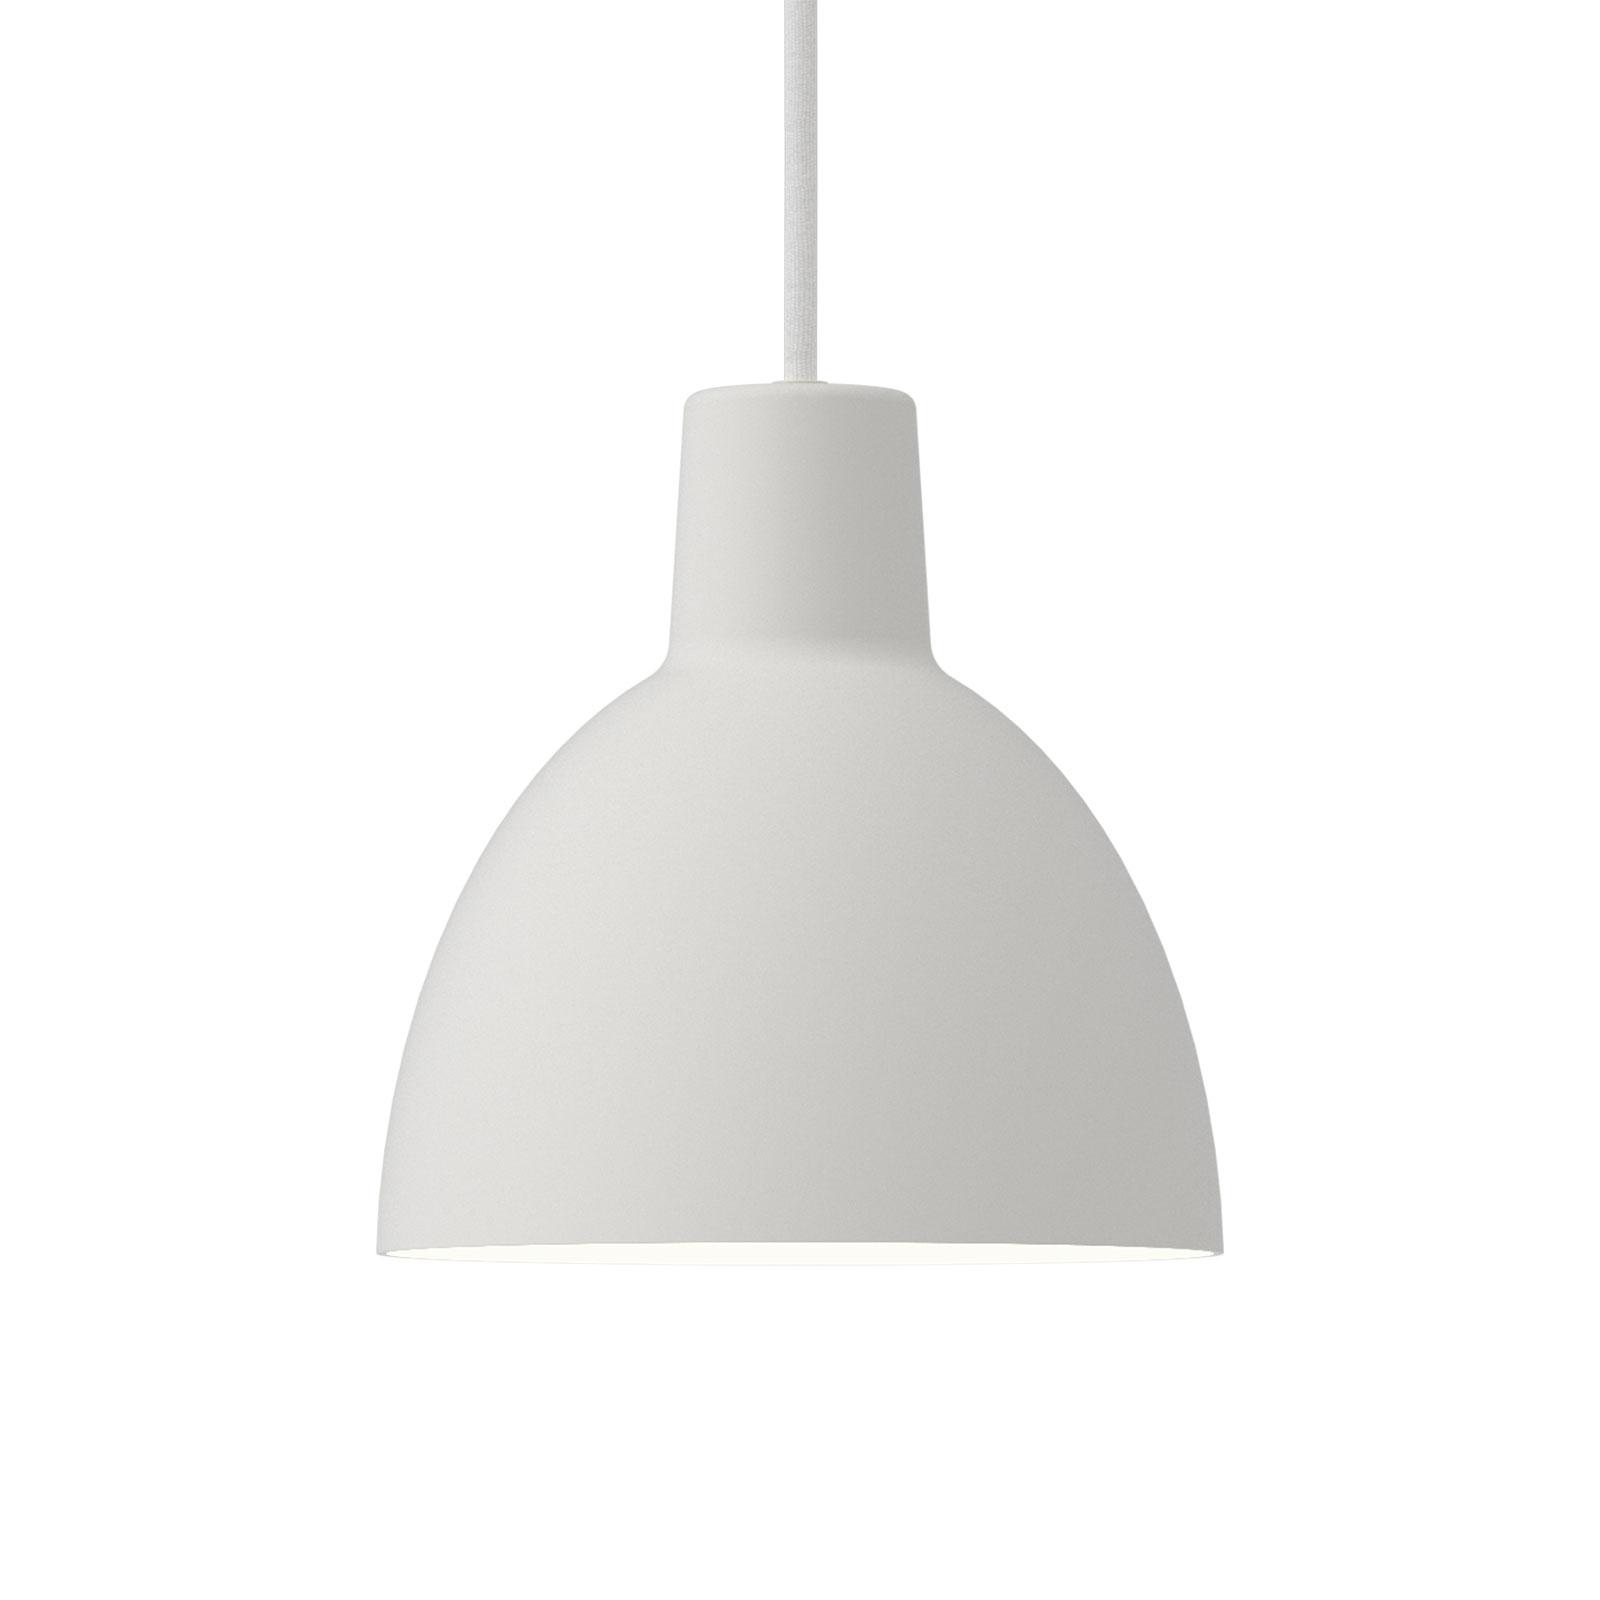 Louis Poulsen hanglamp Toldbod 170, wit